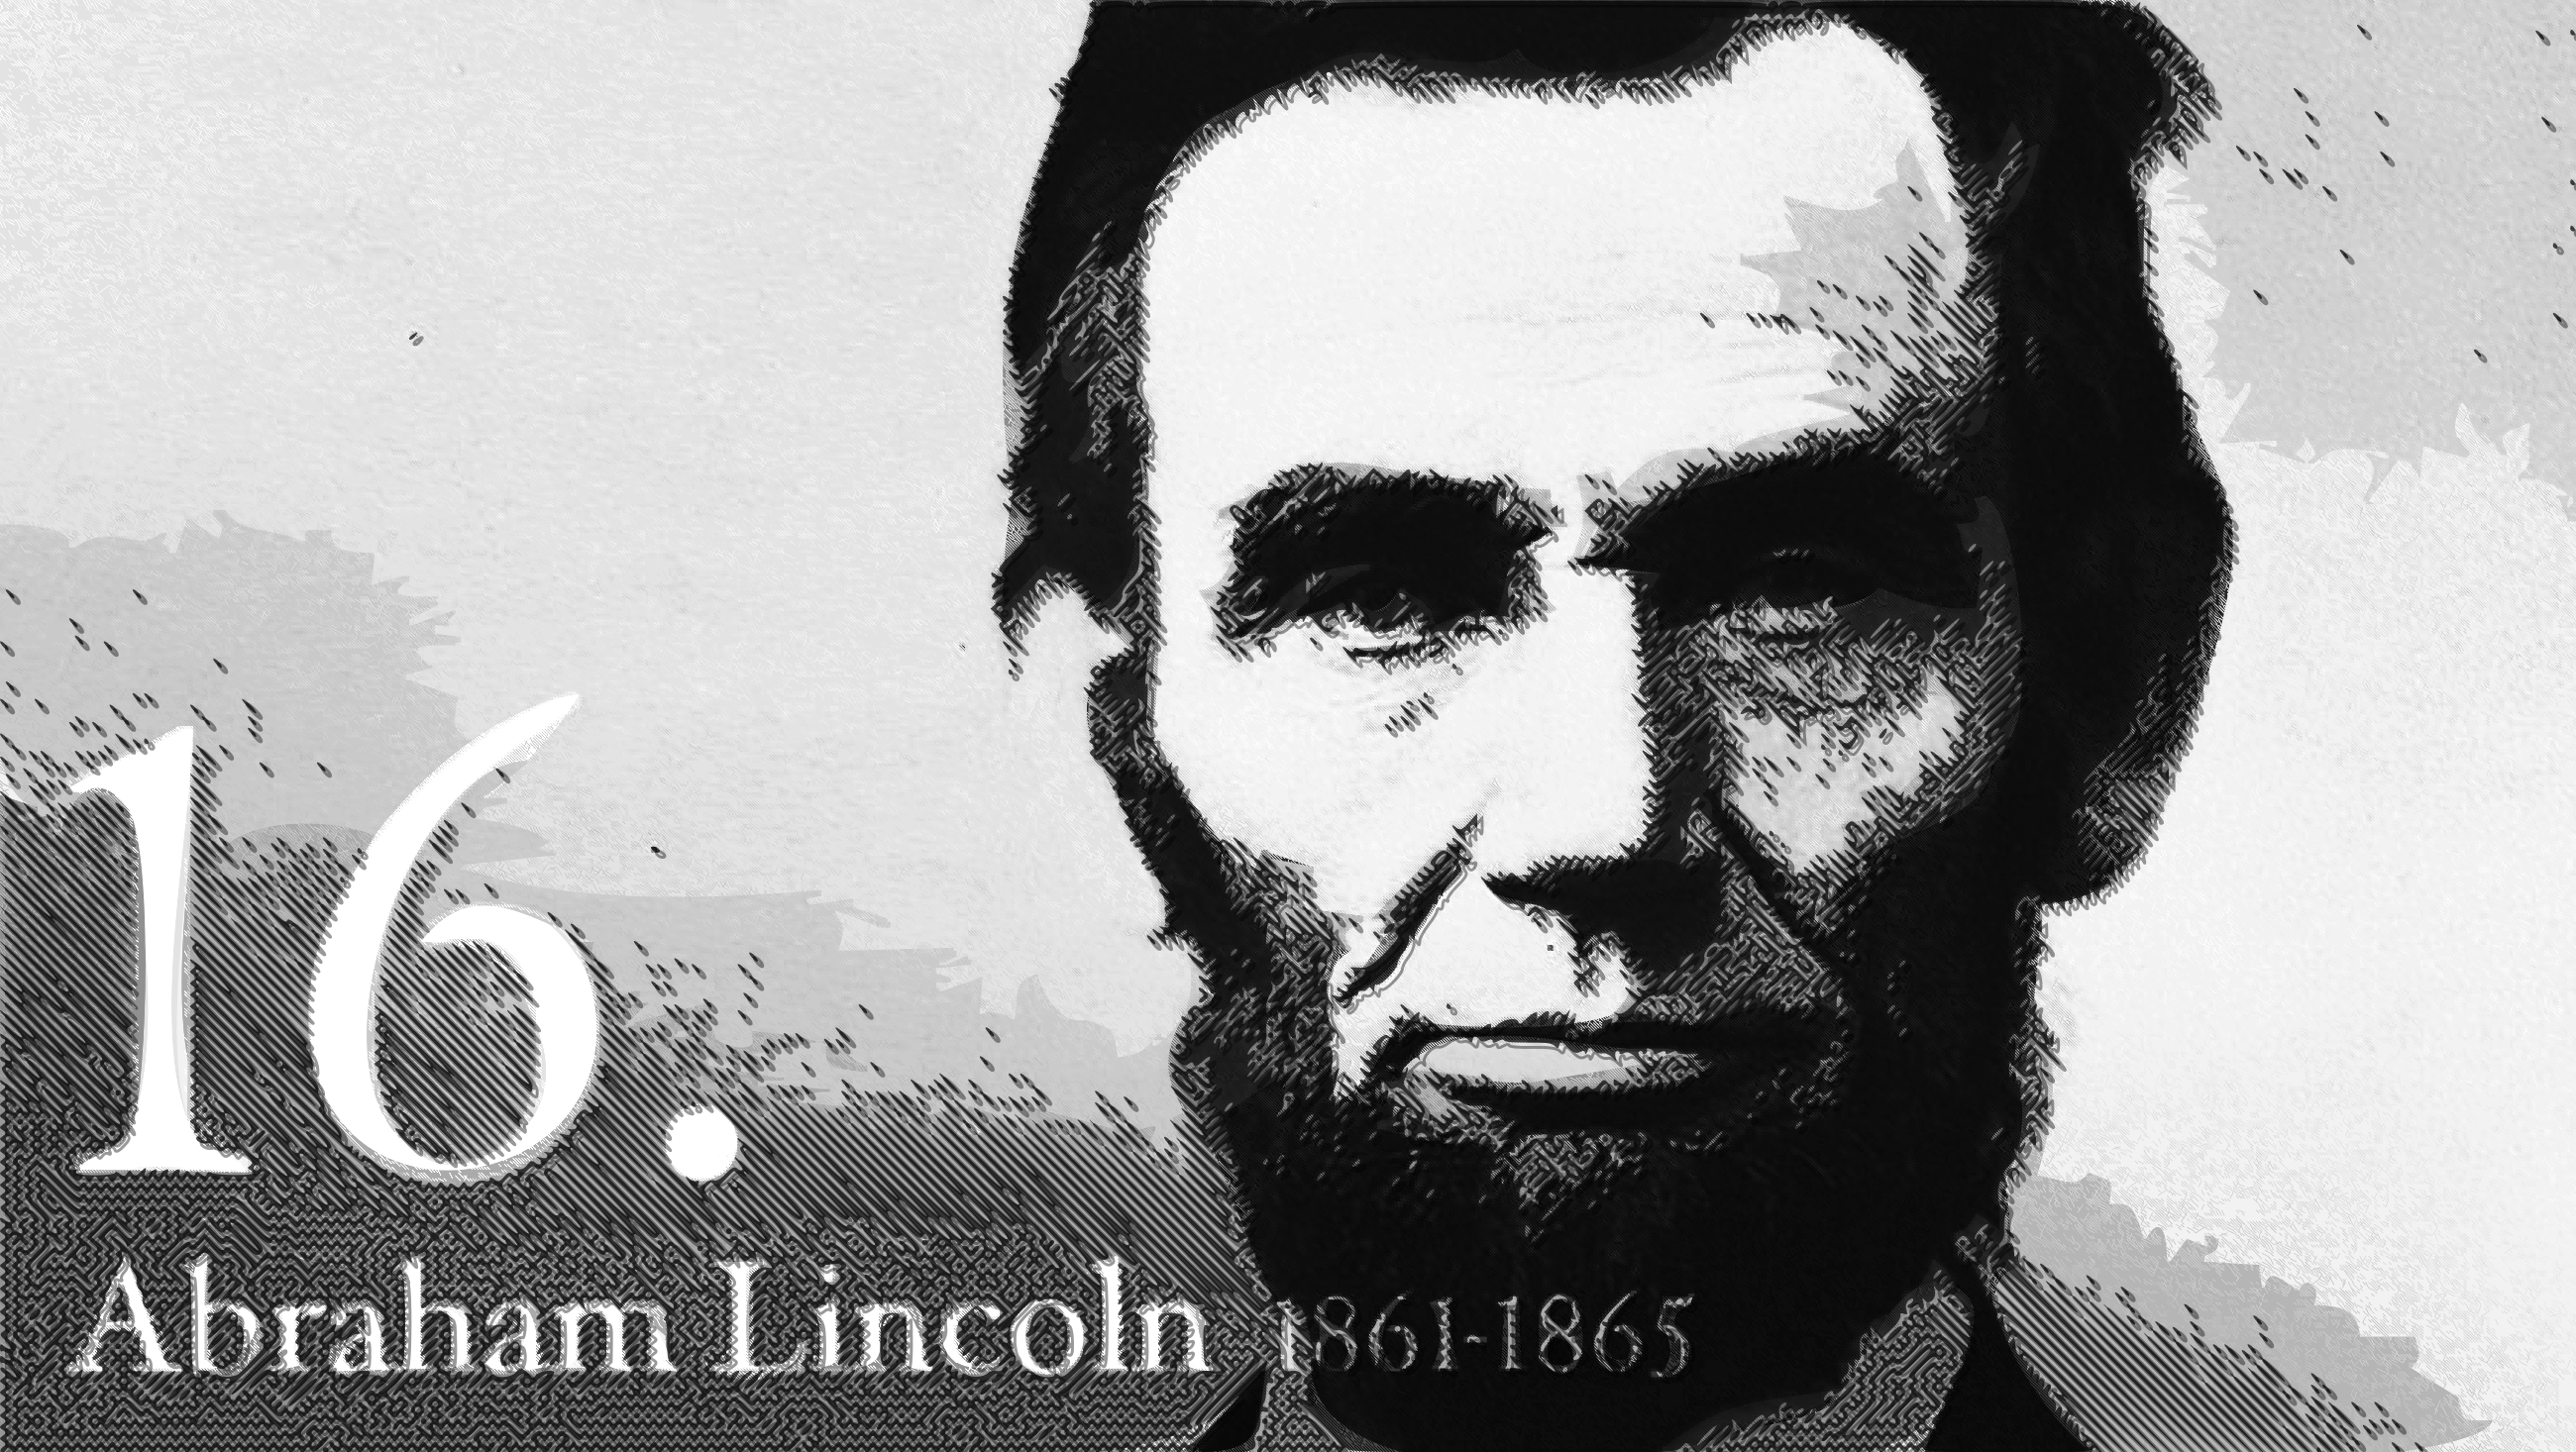 Download Abraham Lincoln Wallpaper 2600x1466 Wallpoper 2600x1466